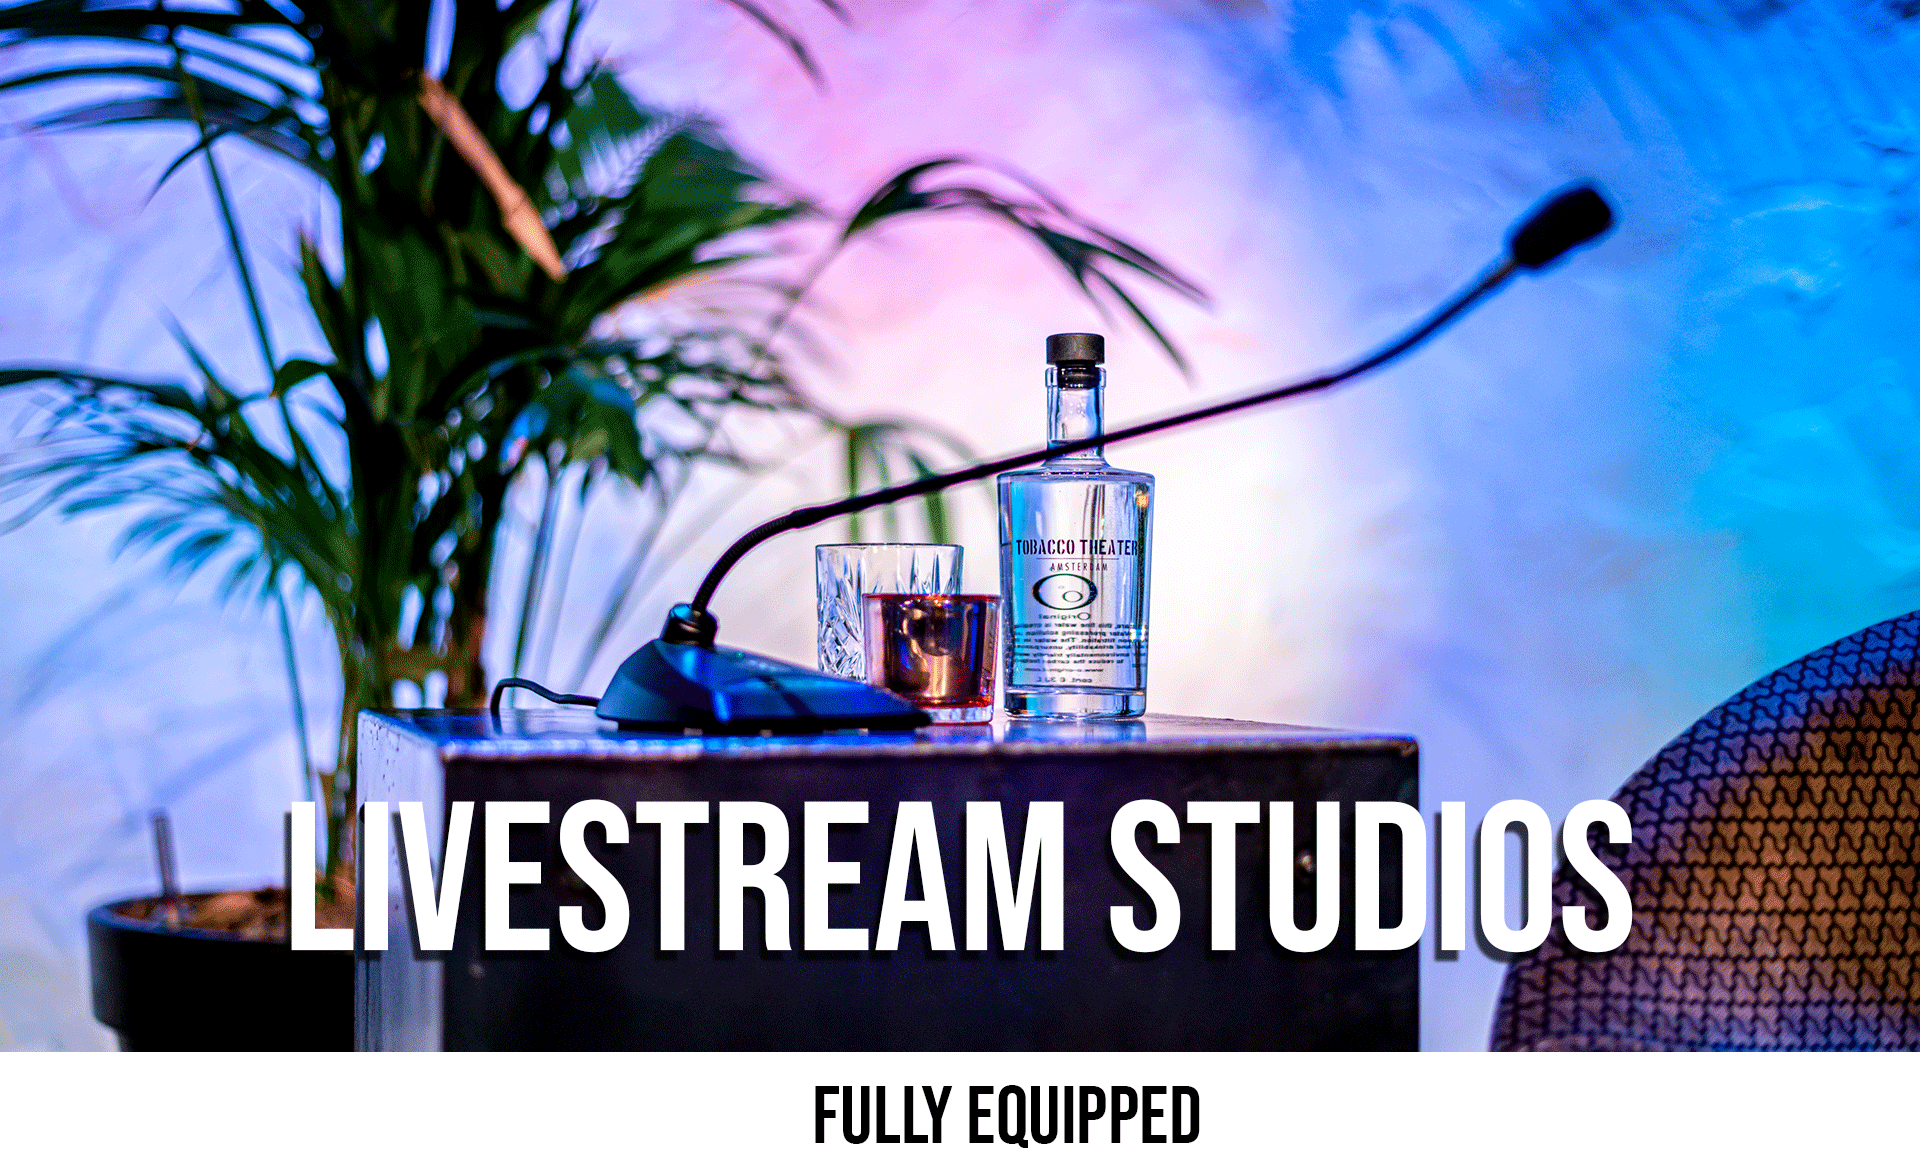 Livestream Studios Amsterdam